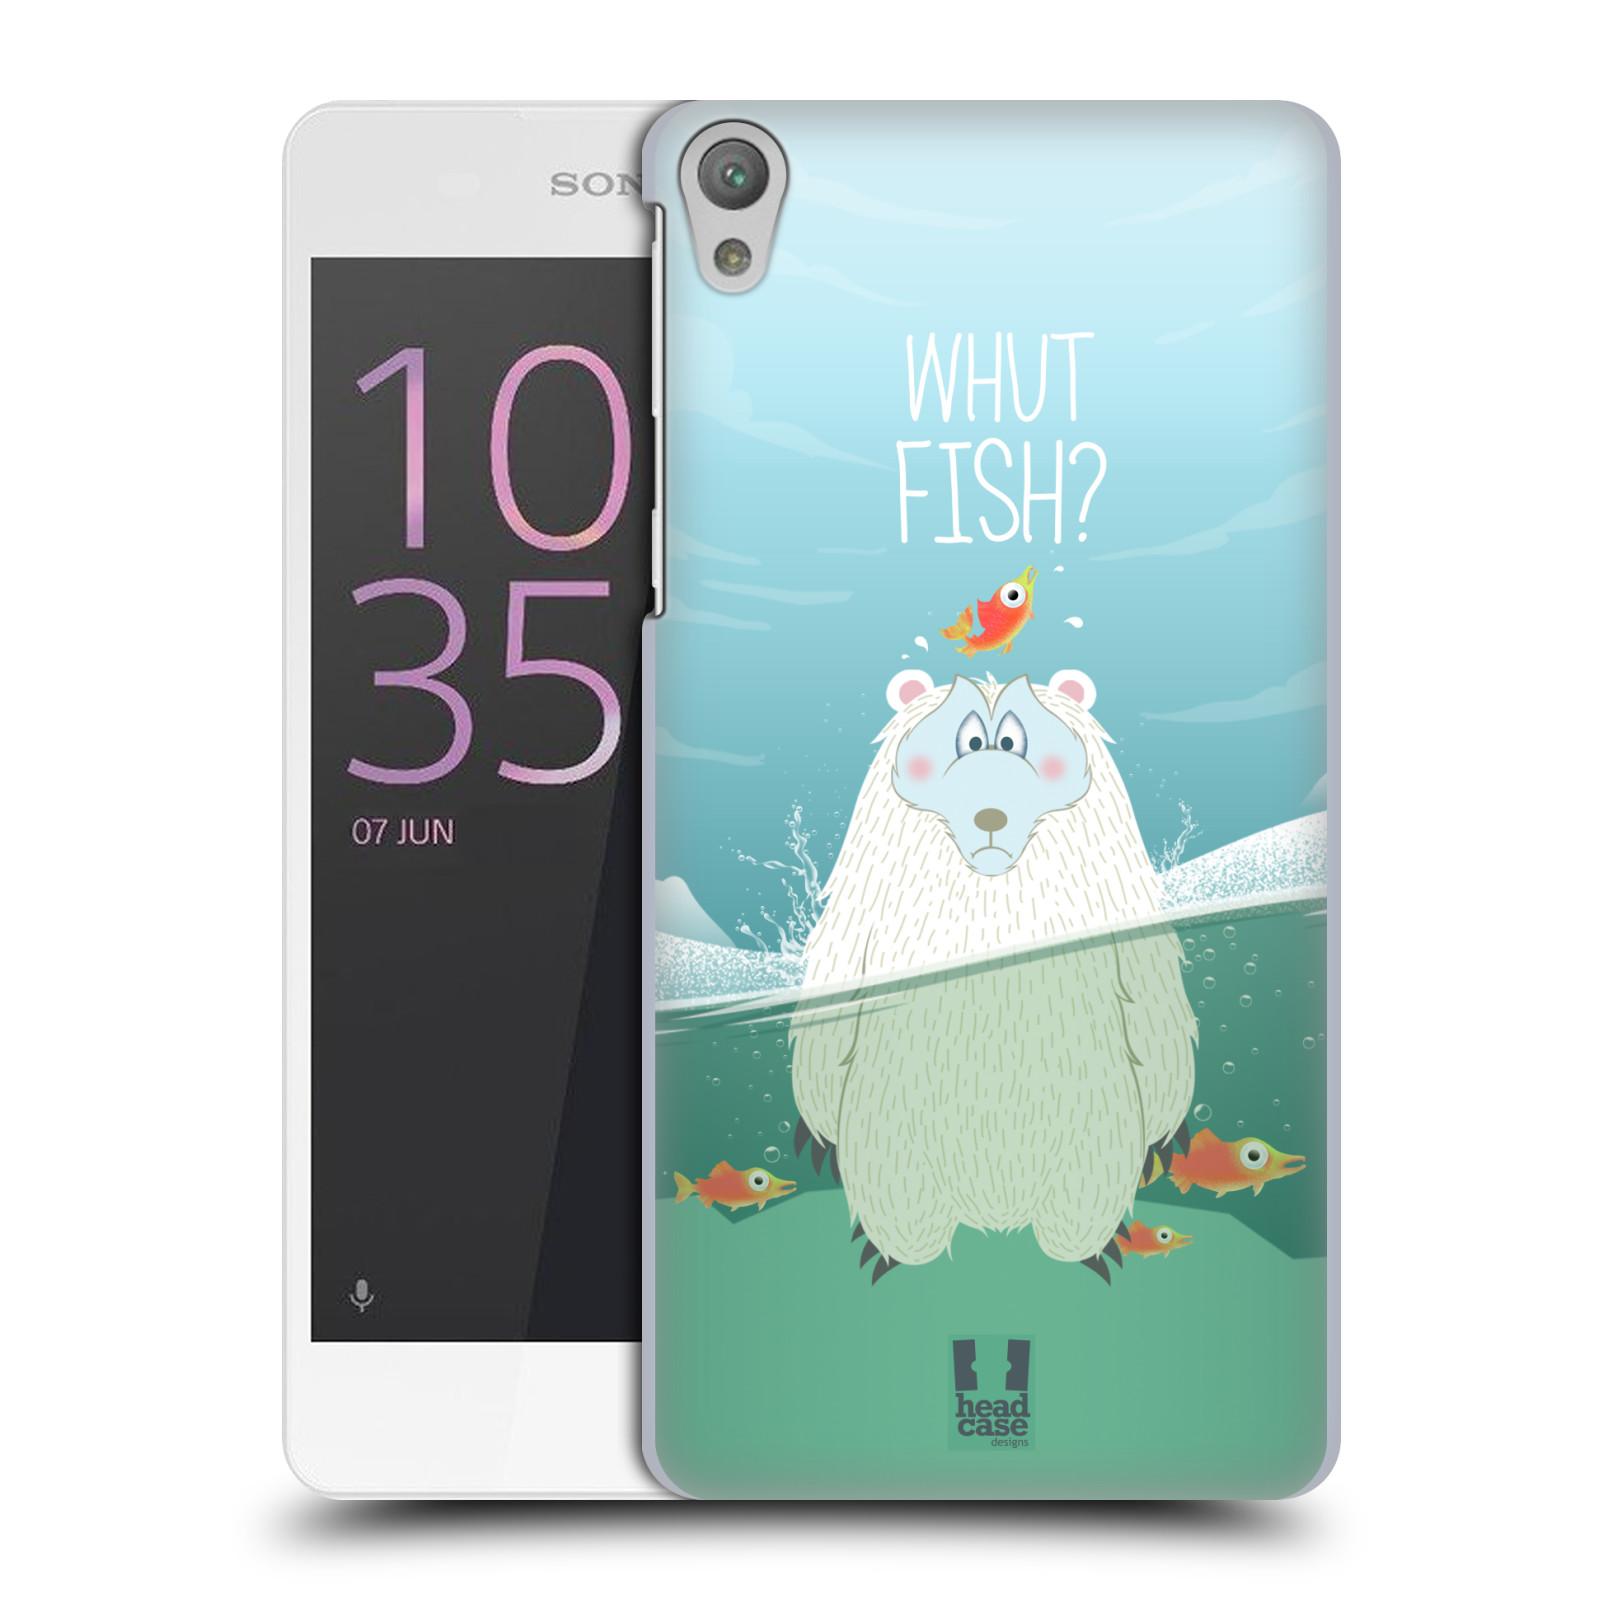 Plastové pouzdro na mobil Sony Xperia E5 HEAD CASE Medvěd Whut Fish?